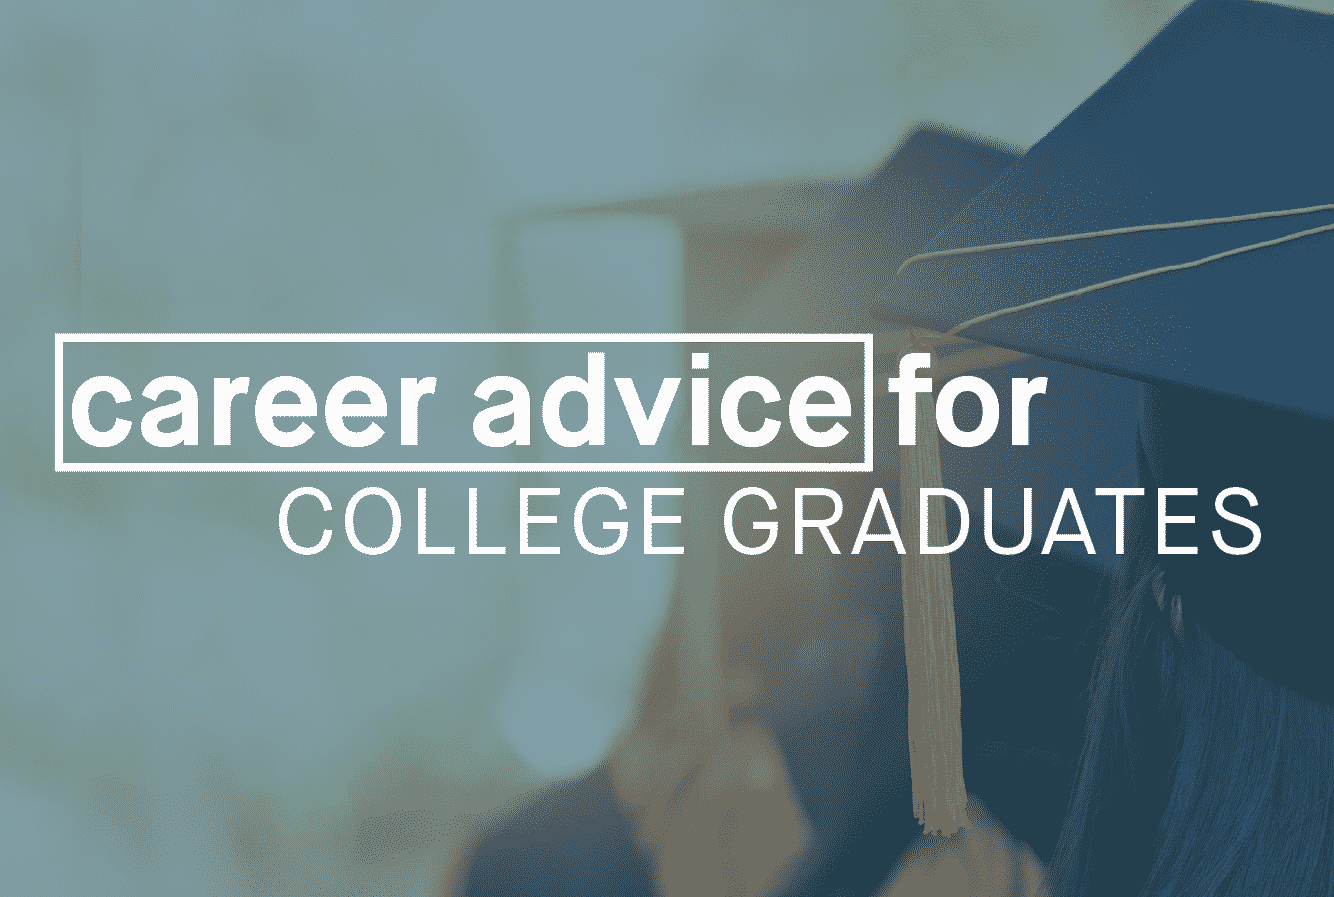 20190524_CareerAdvice-03-1